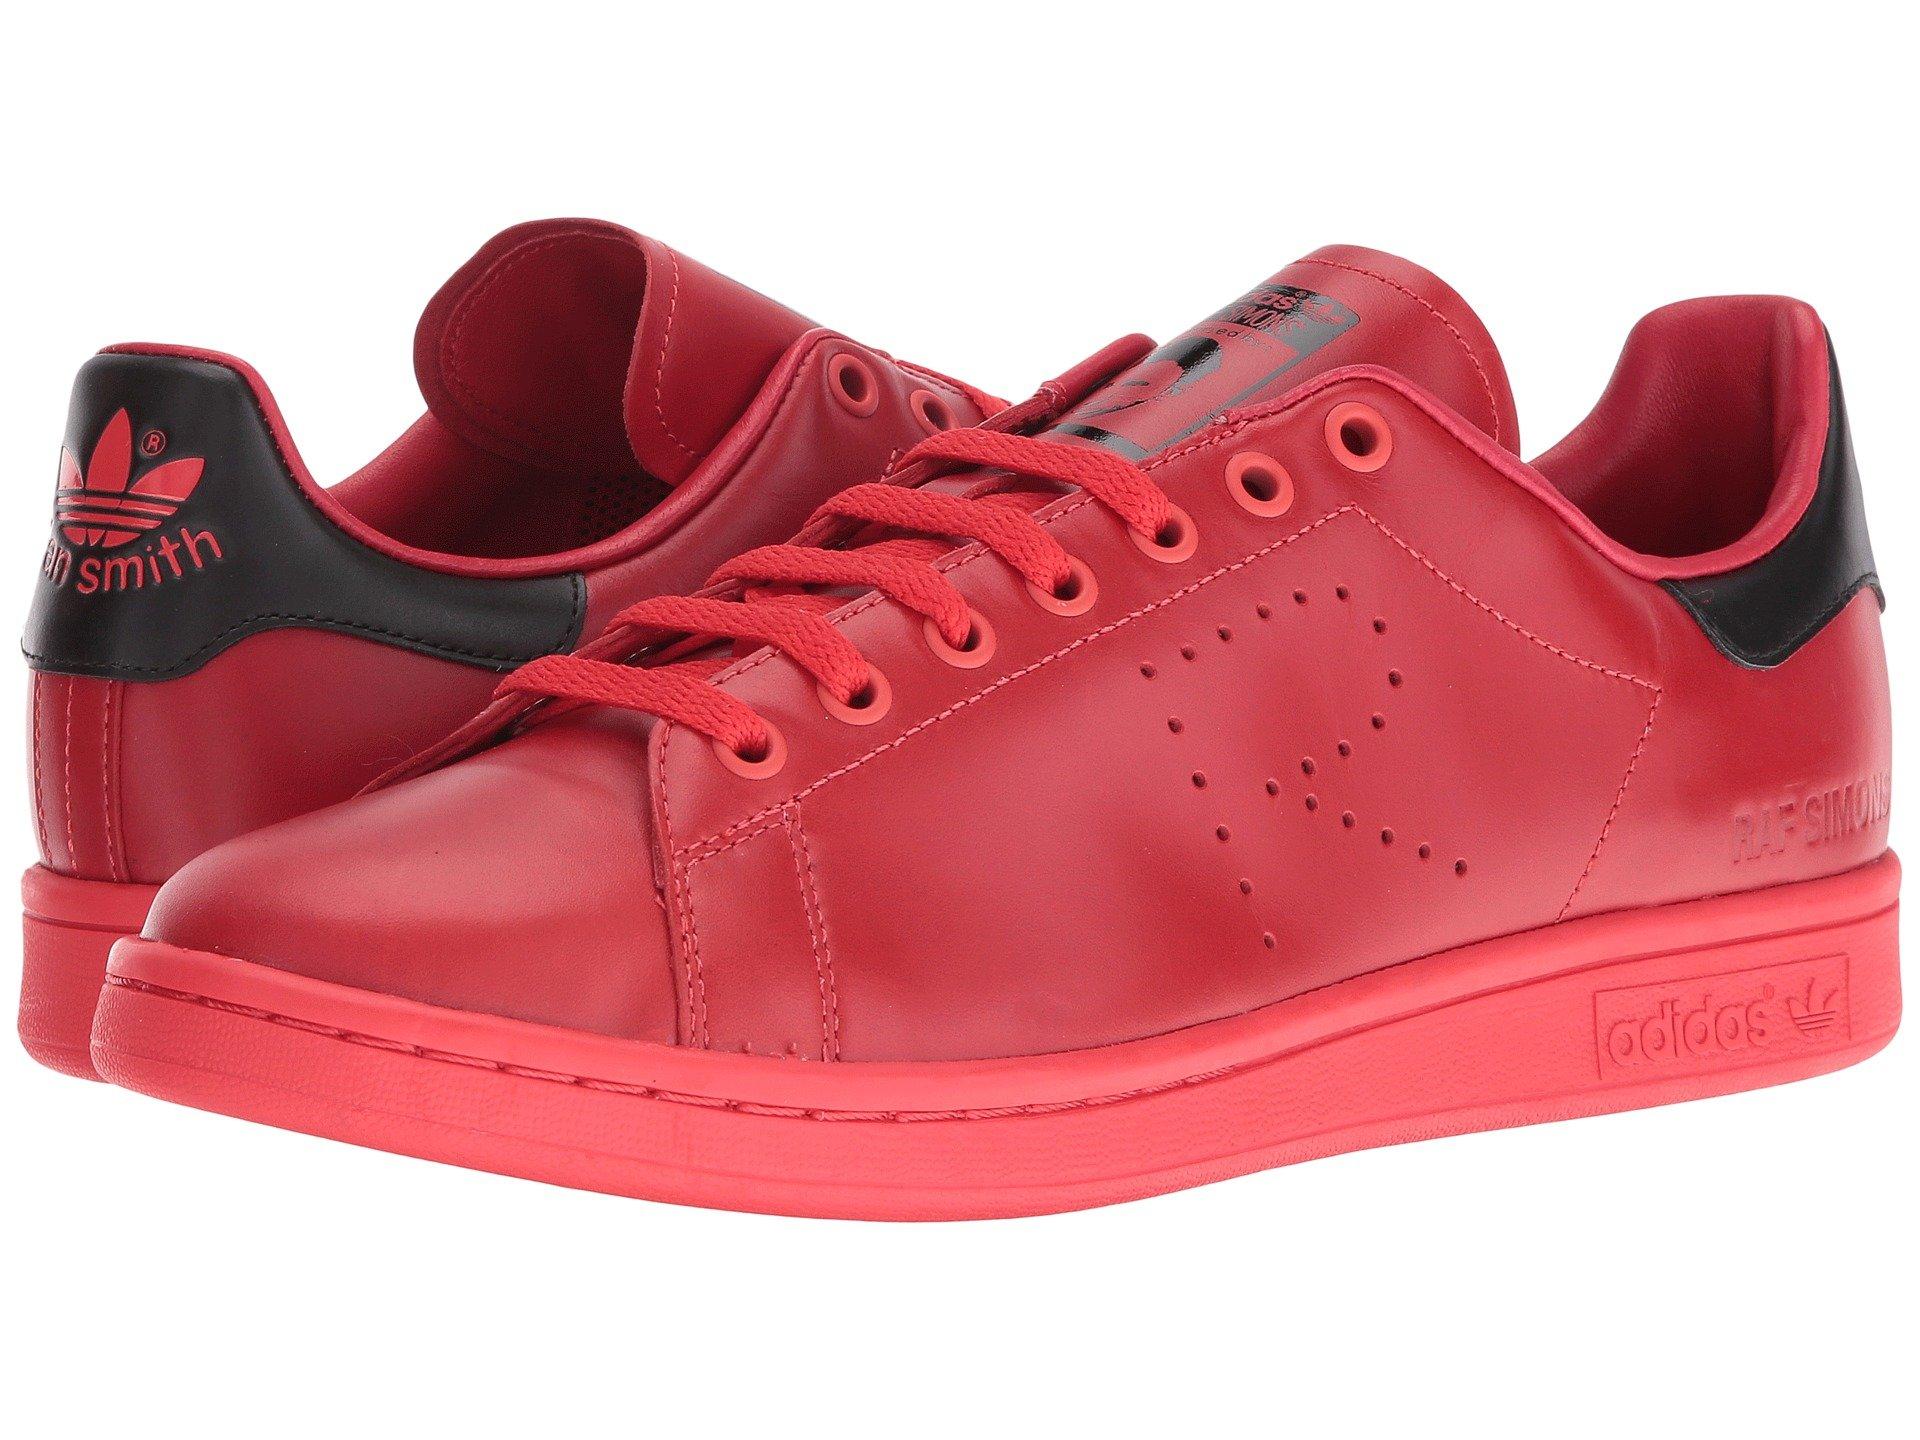 Adidas By Raf Simons Raf Simons Stan Smith Lace-Up